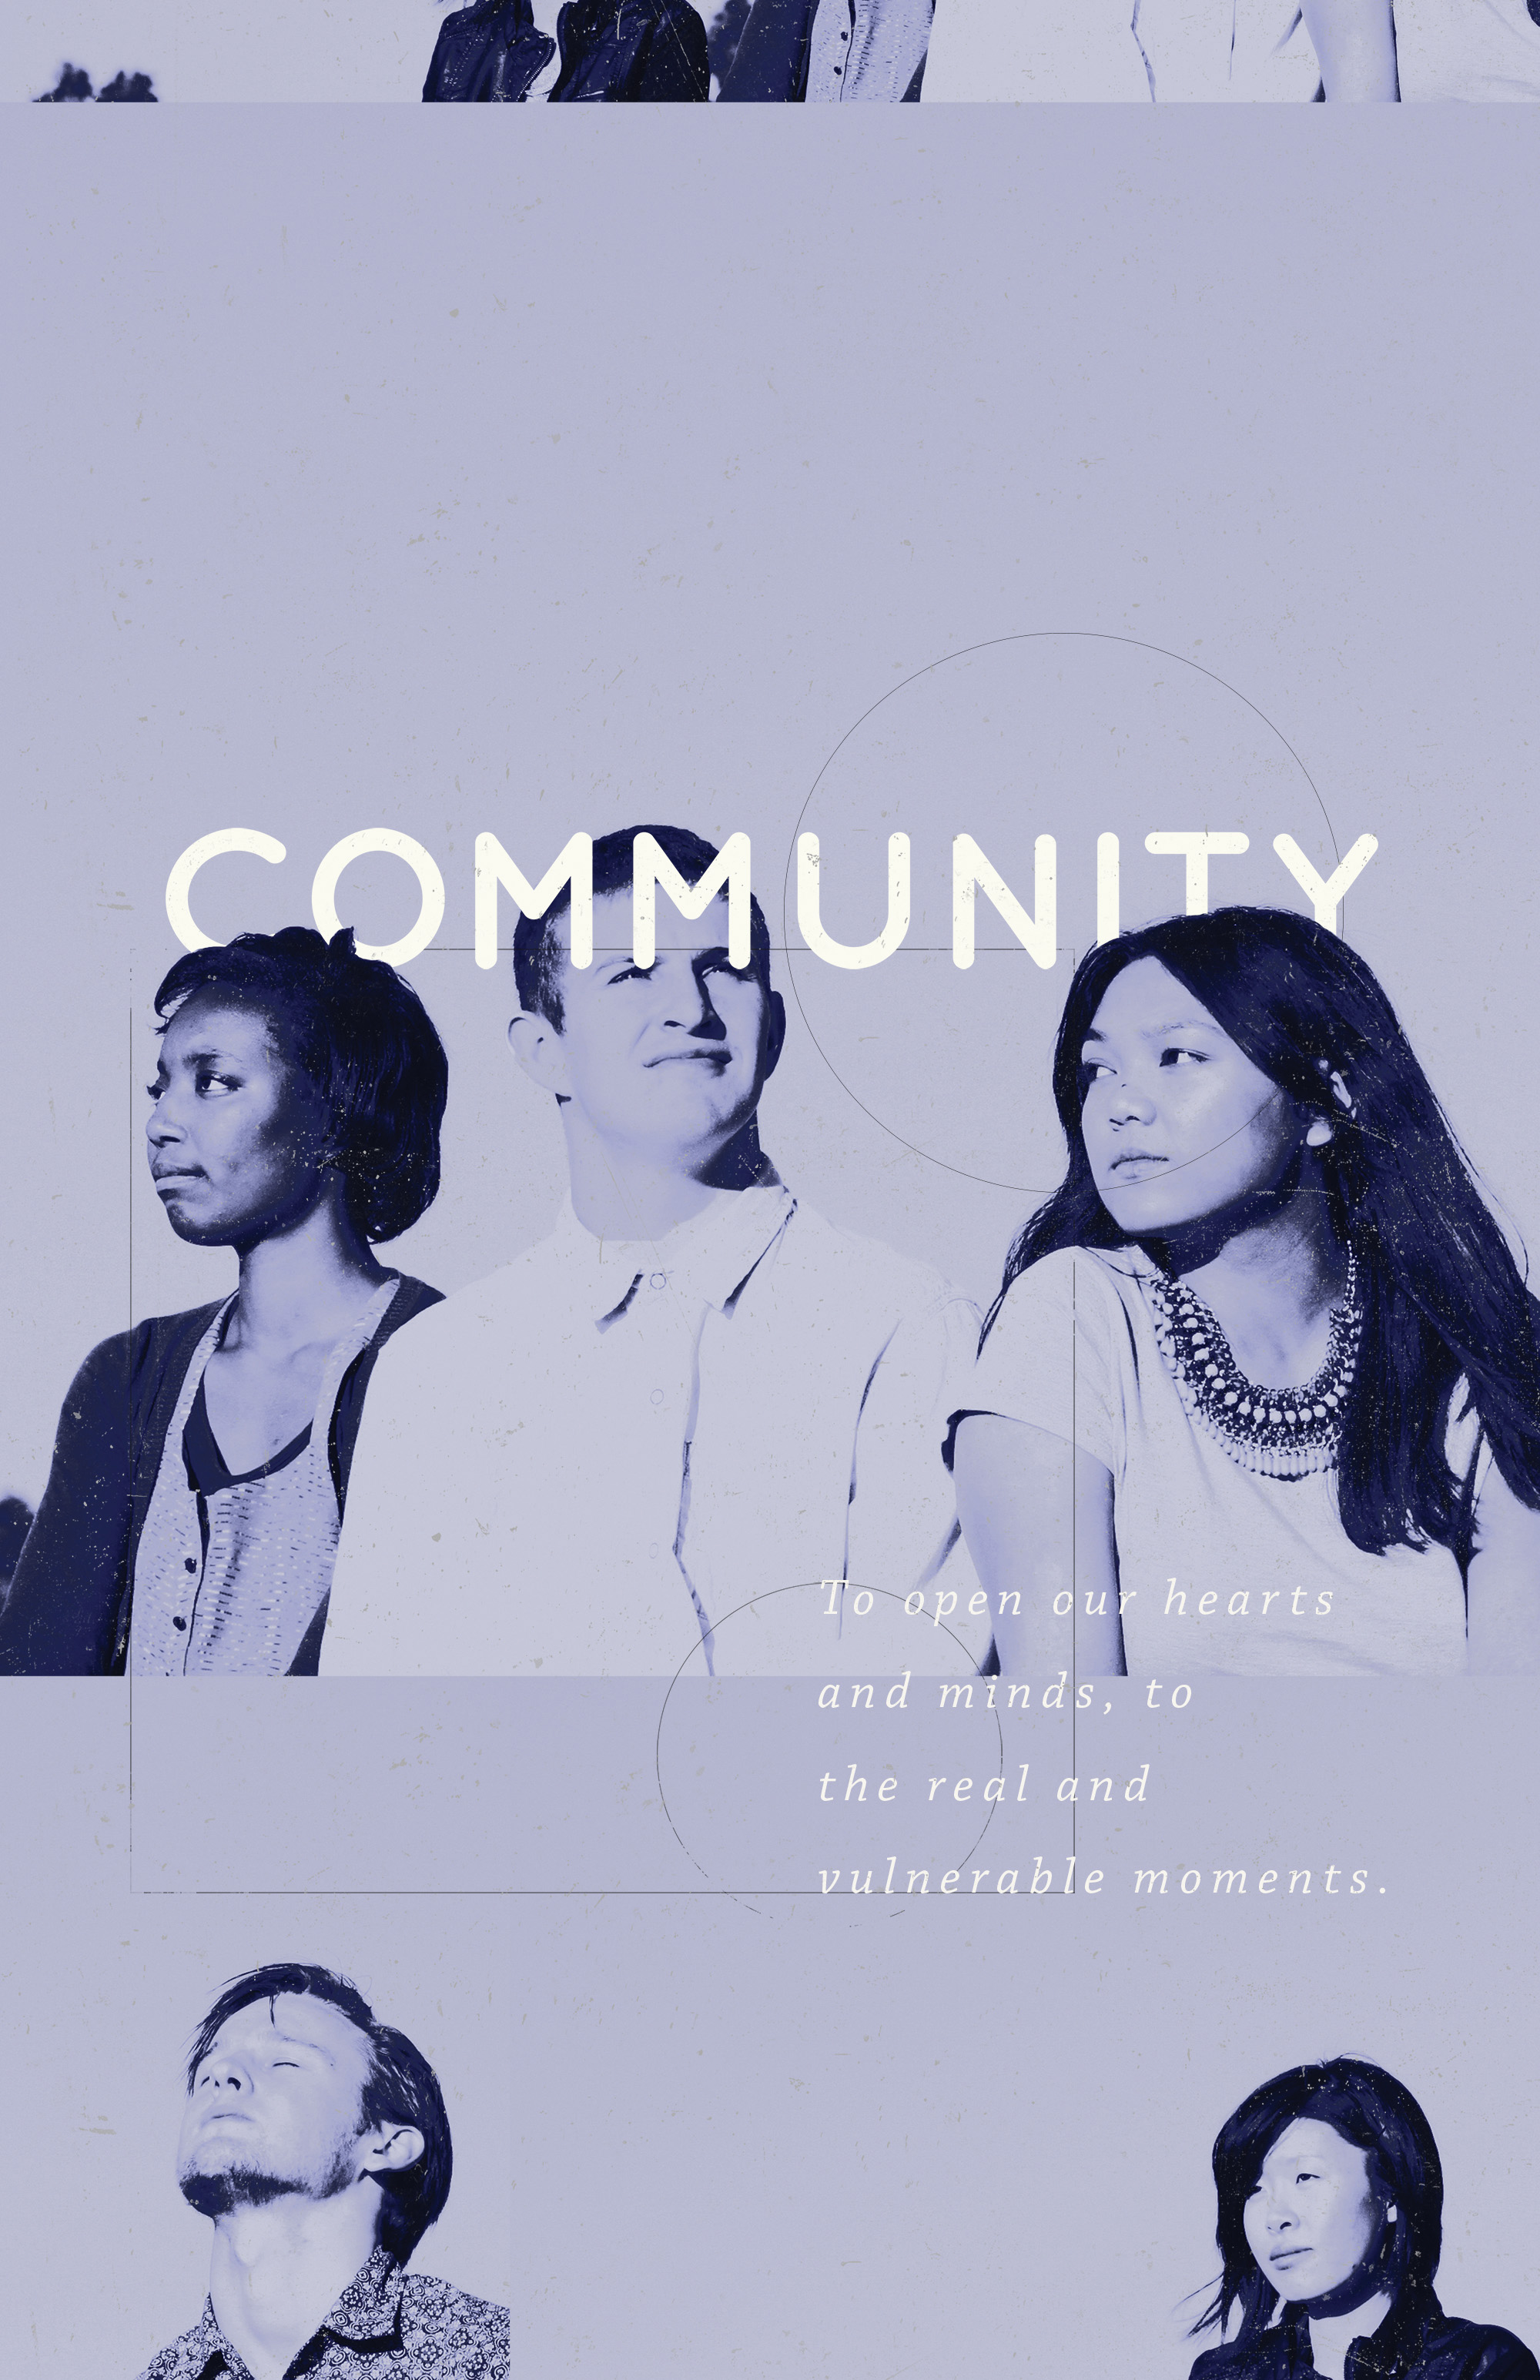 CommunityPoster2.jpg